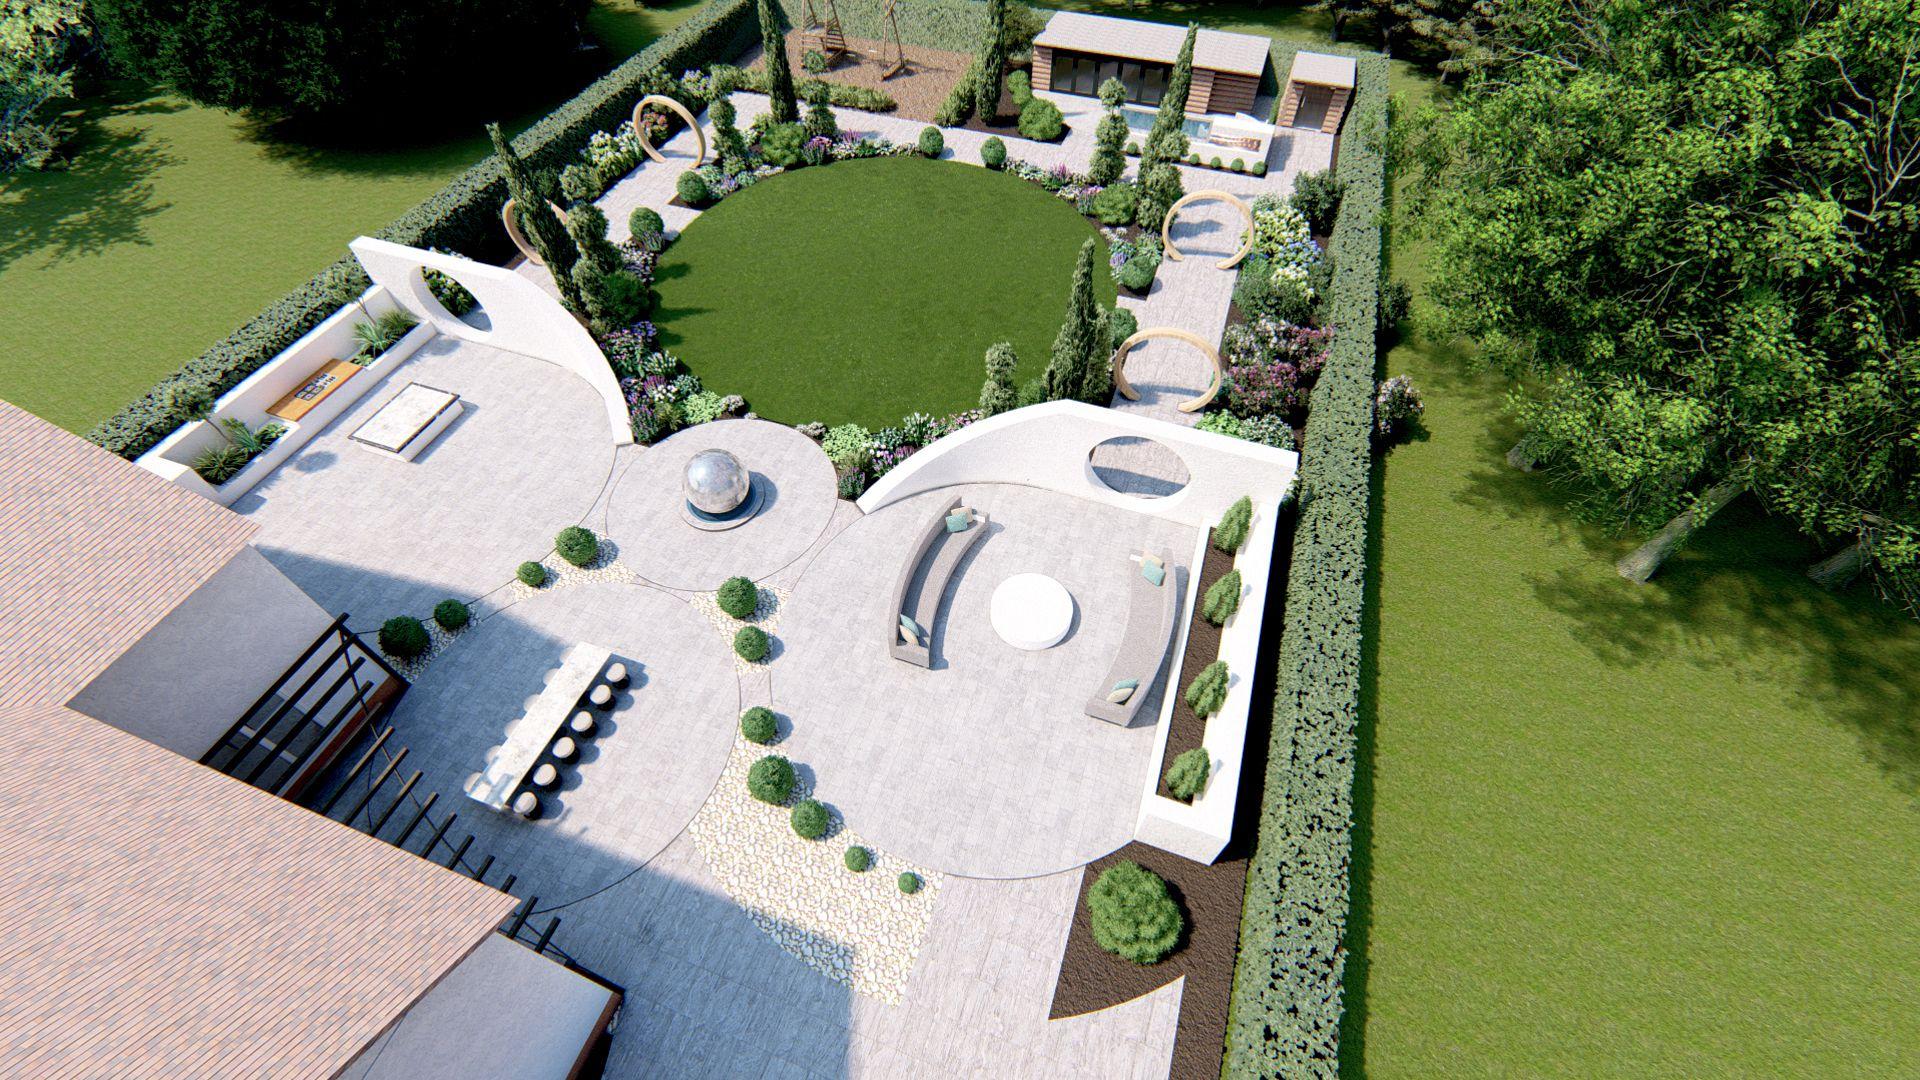 3D Plans Help You To Visualise Your New #garden #garden ... concernant Plan De Jardin 3D